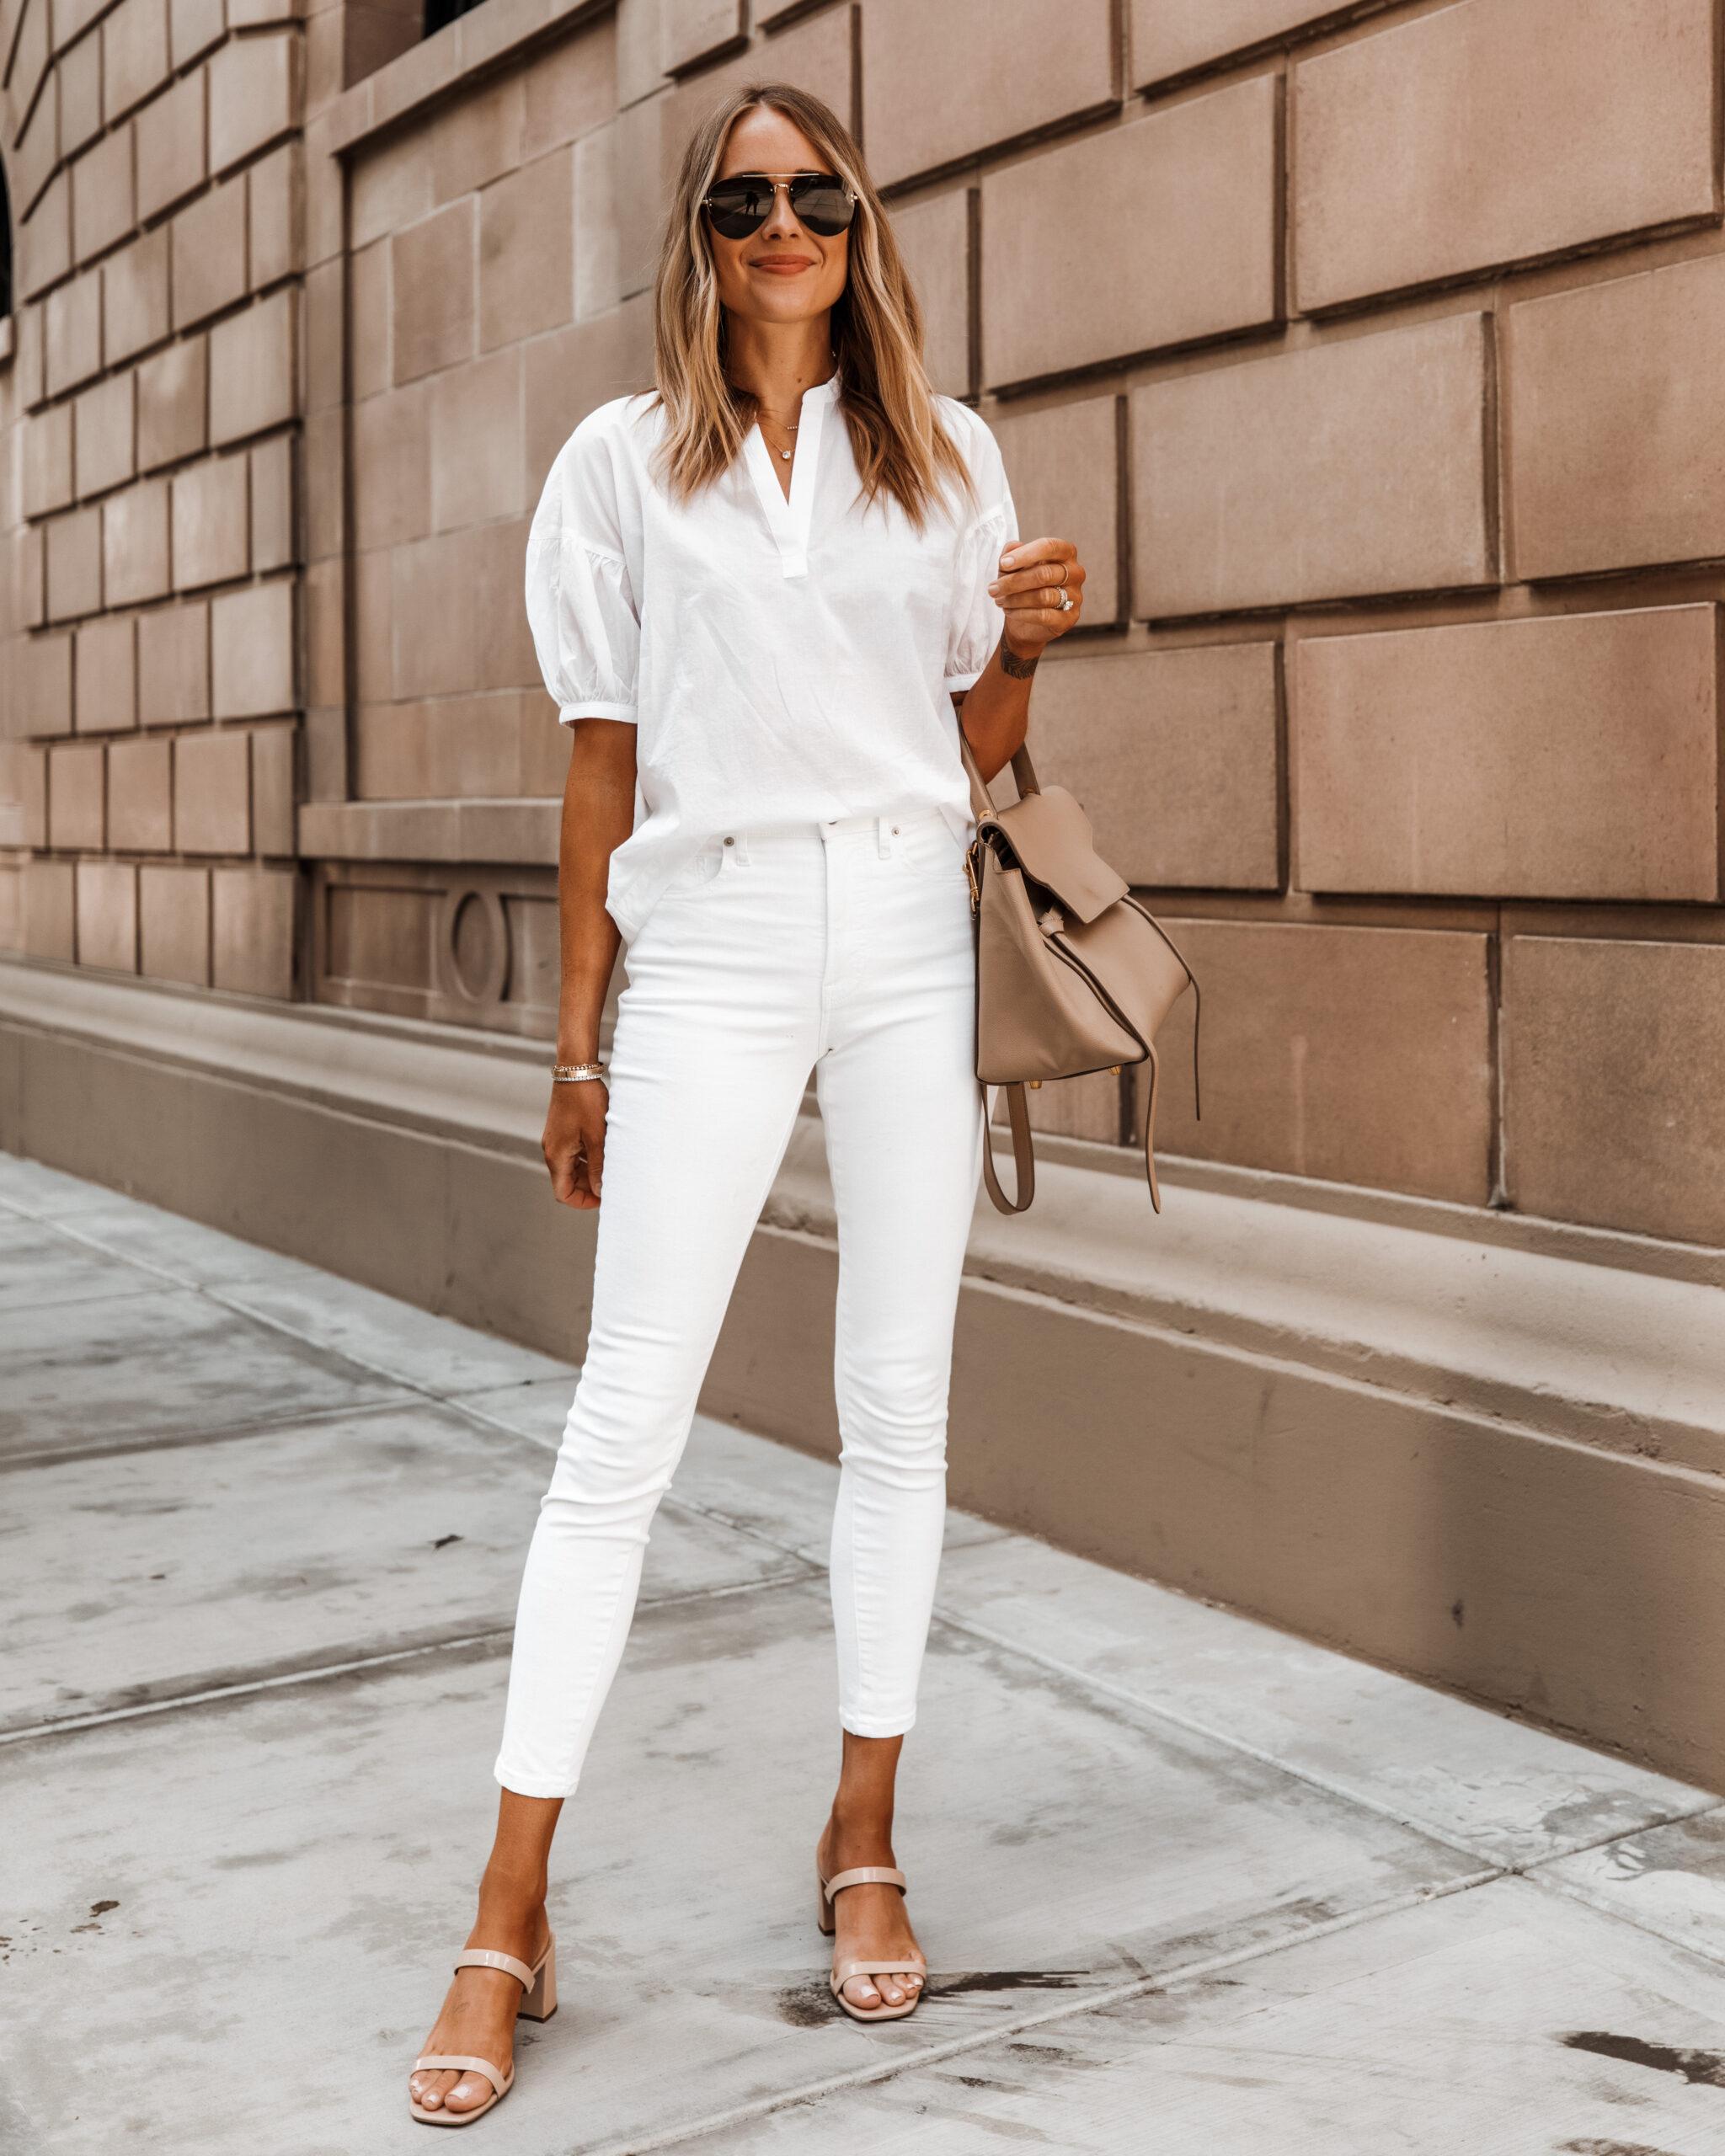 Fashion Jackson Wearing Everlane White Puff Sleeve Top White Skinny Jeans Nude Sandals Celine Belt Bag